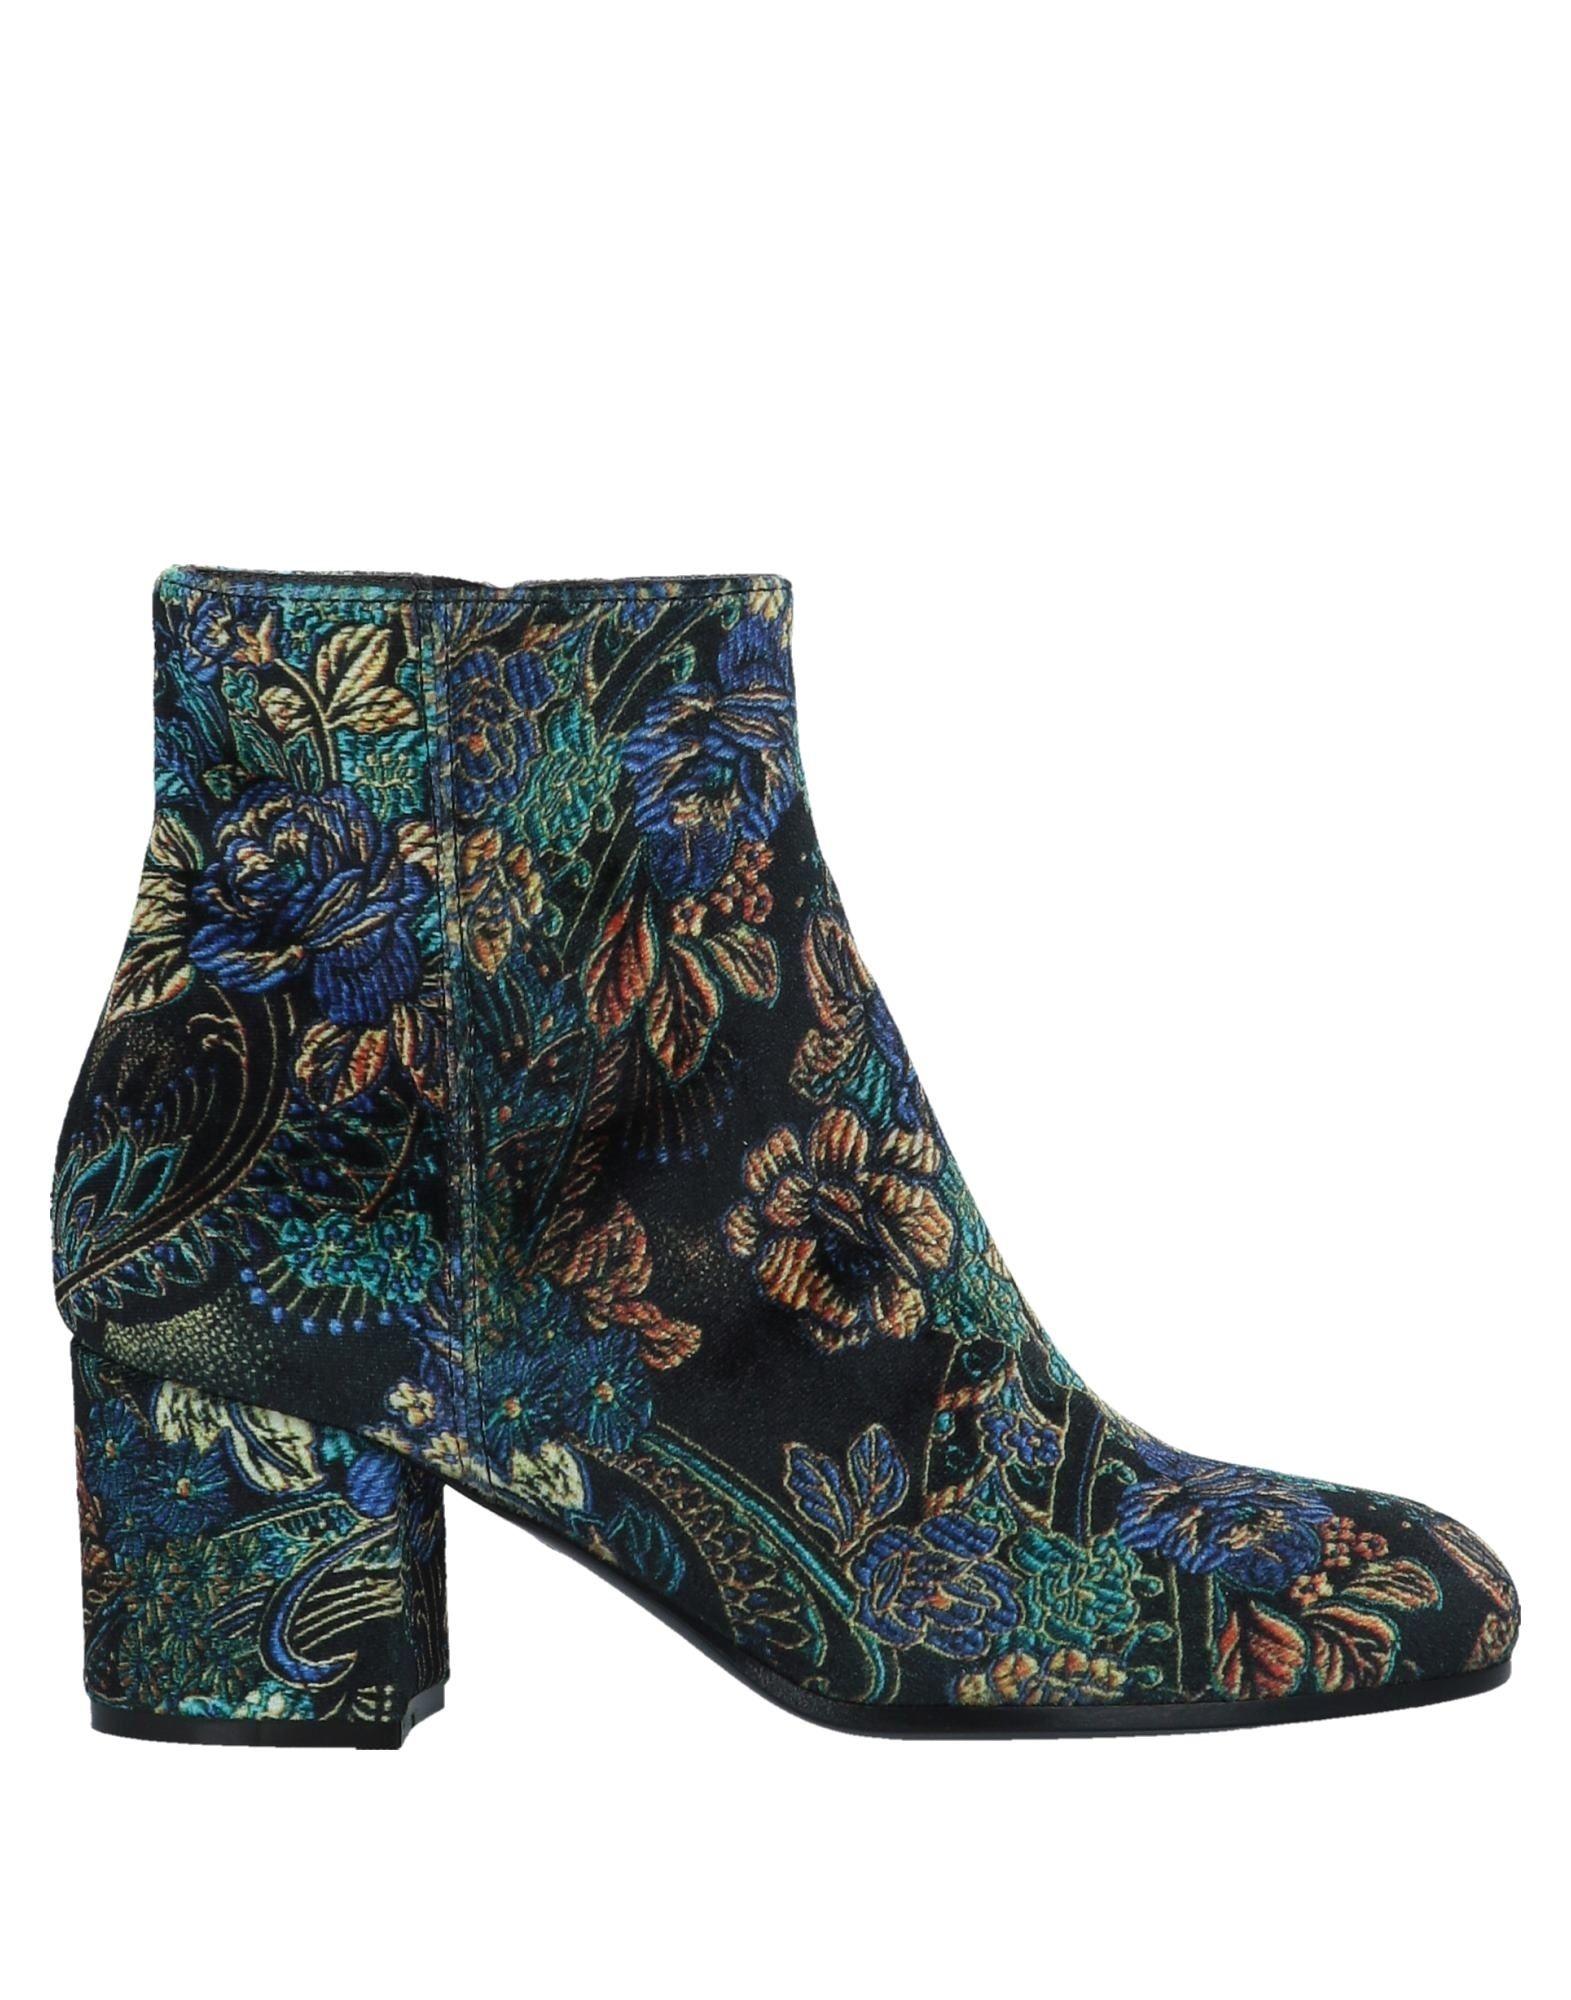 Via Roma 15 Ankle Boot - Women Via online Roma 15 Ankle Boots online Via on  Australia - 11560907NI 7798d3